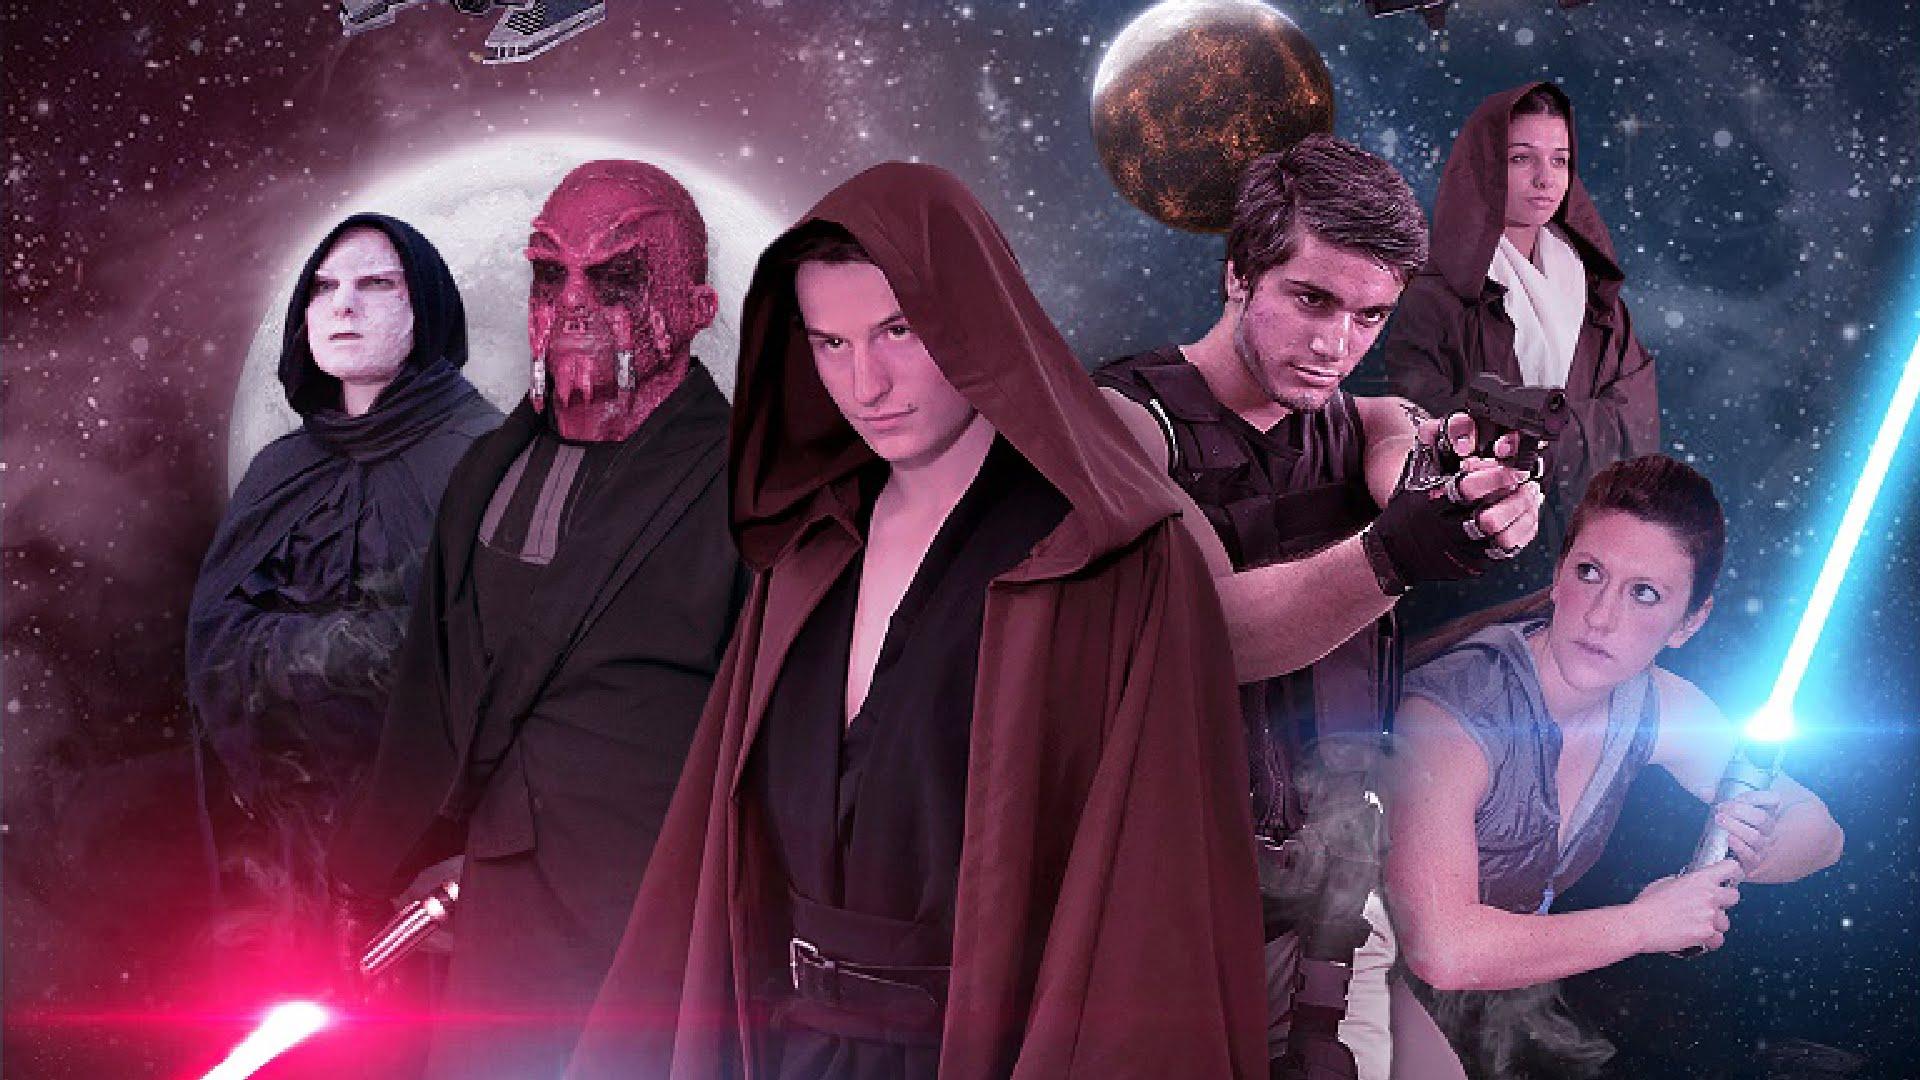 Darth Maul Apprentice 2016 Star Wars Fan Film Full Movie Greek